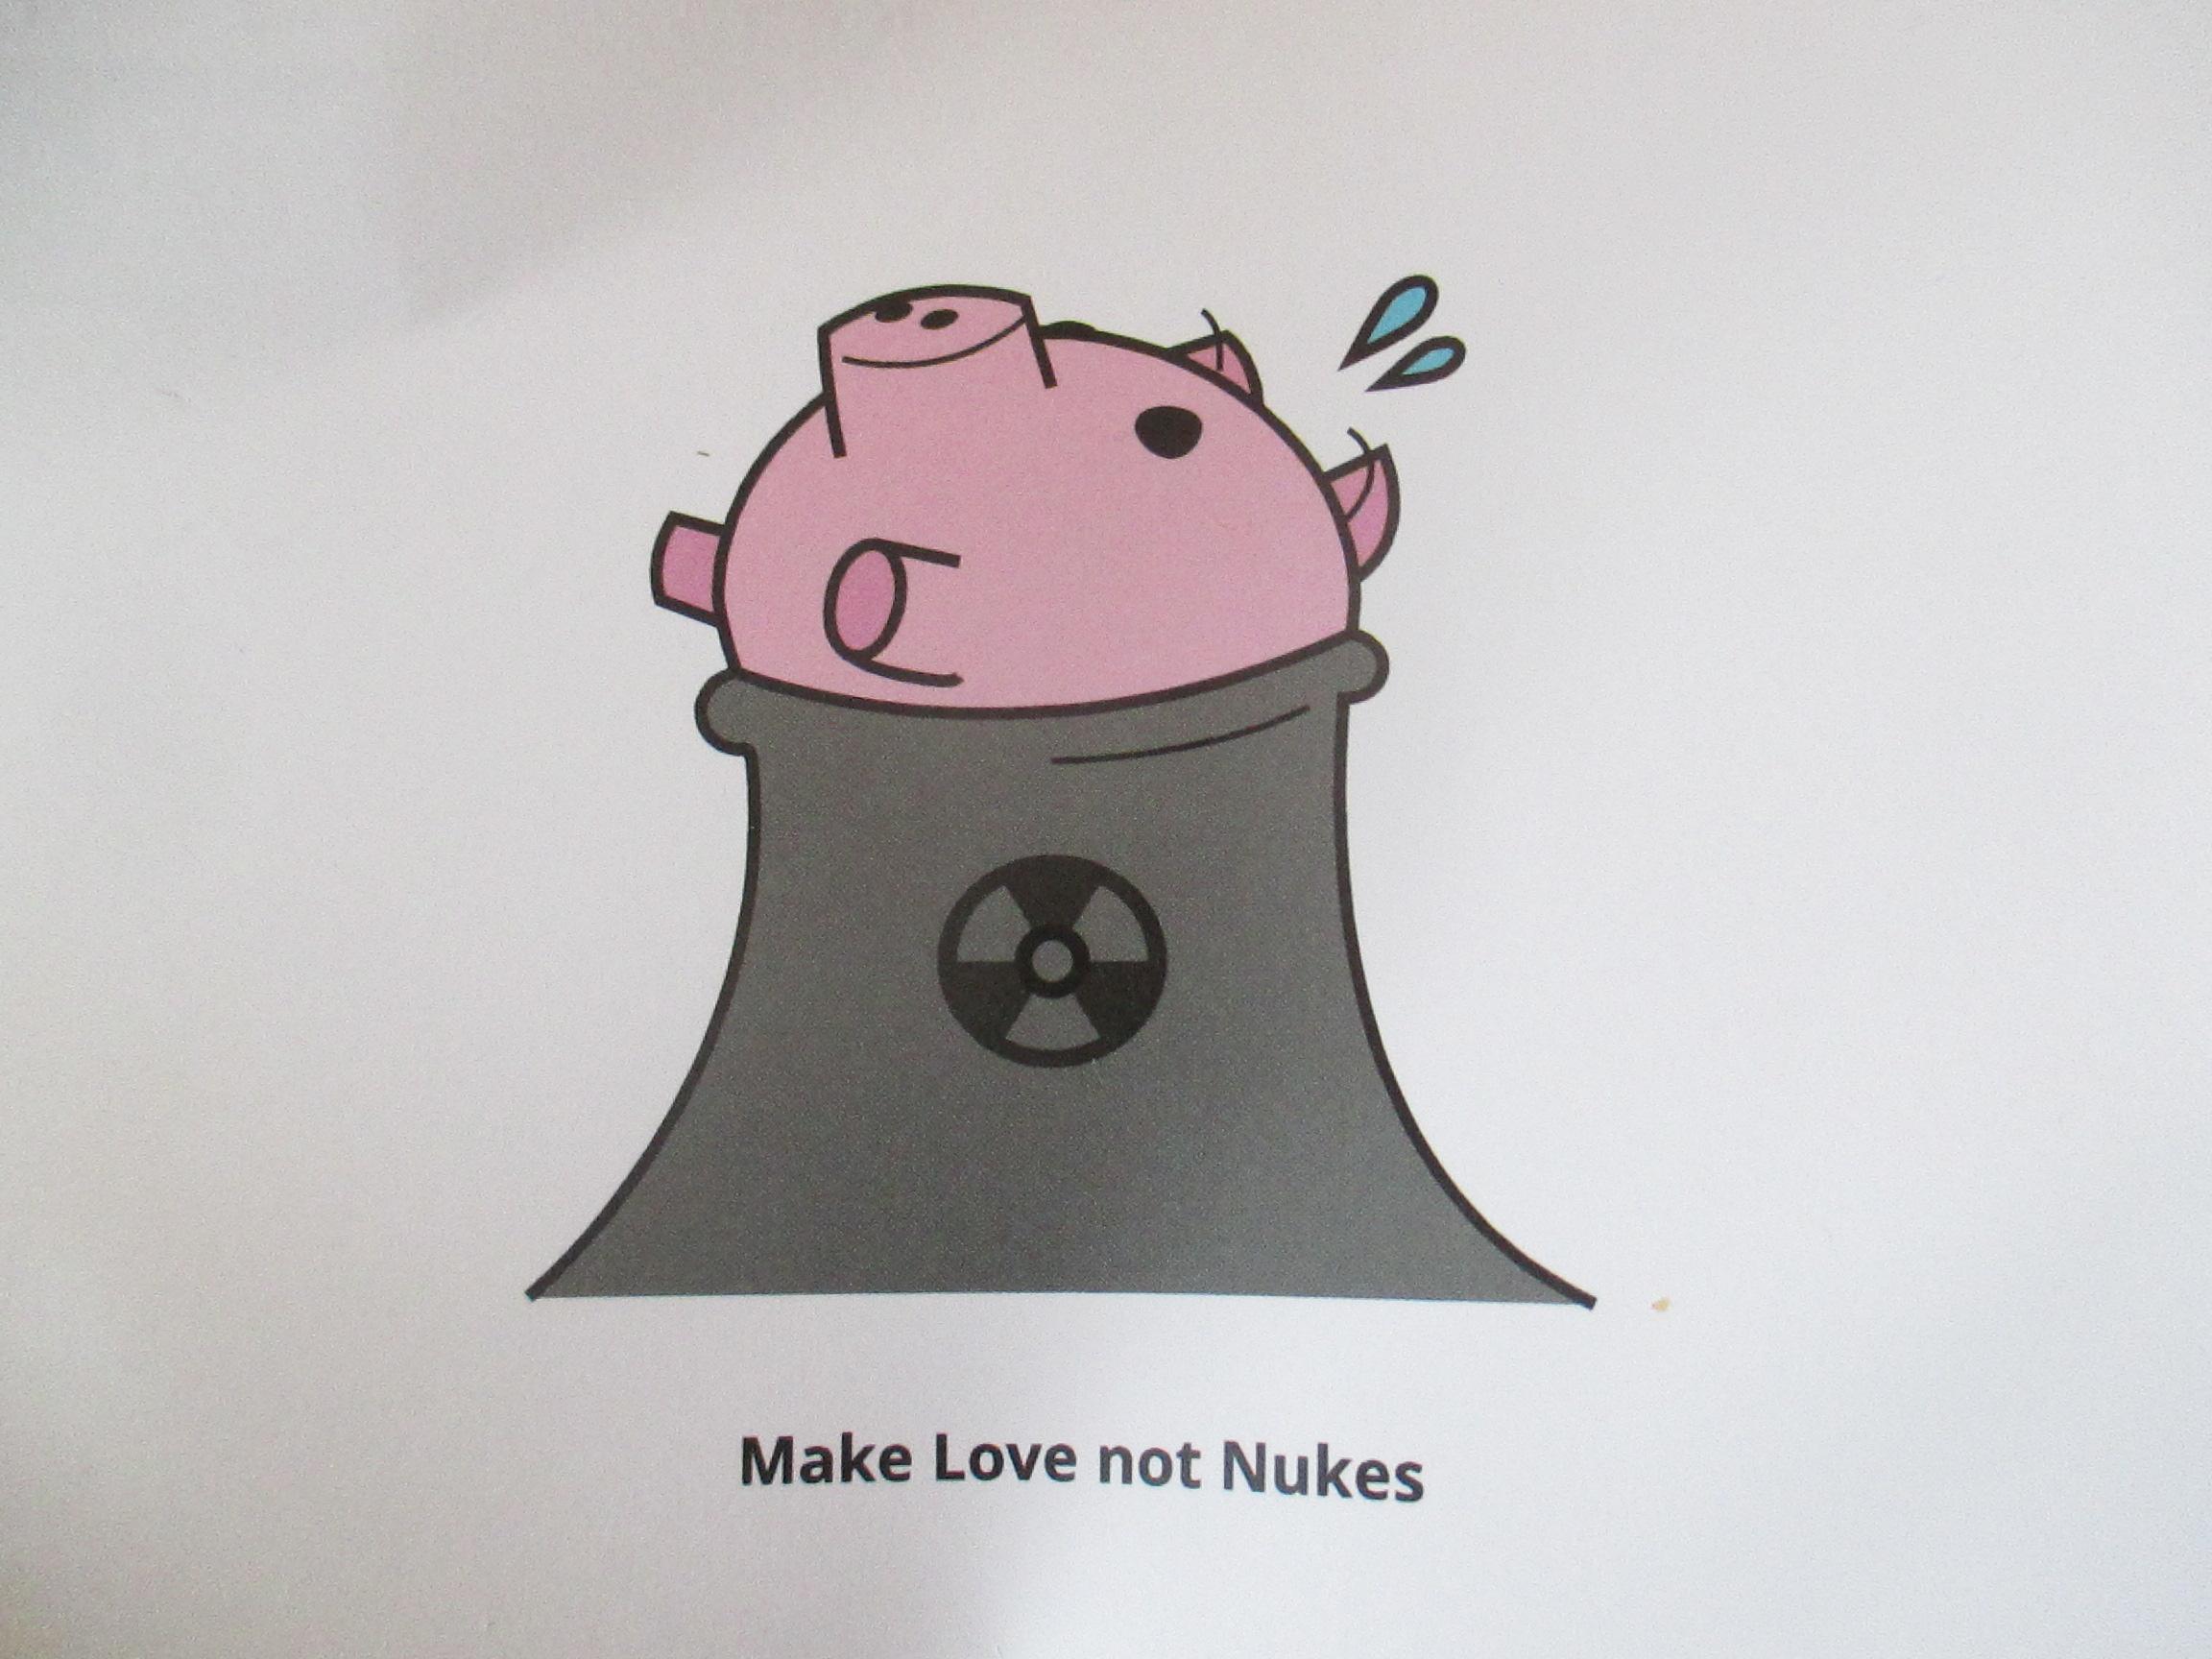 foto kerncentrale varkentje